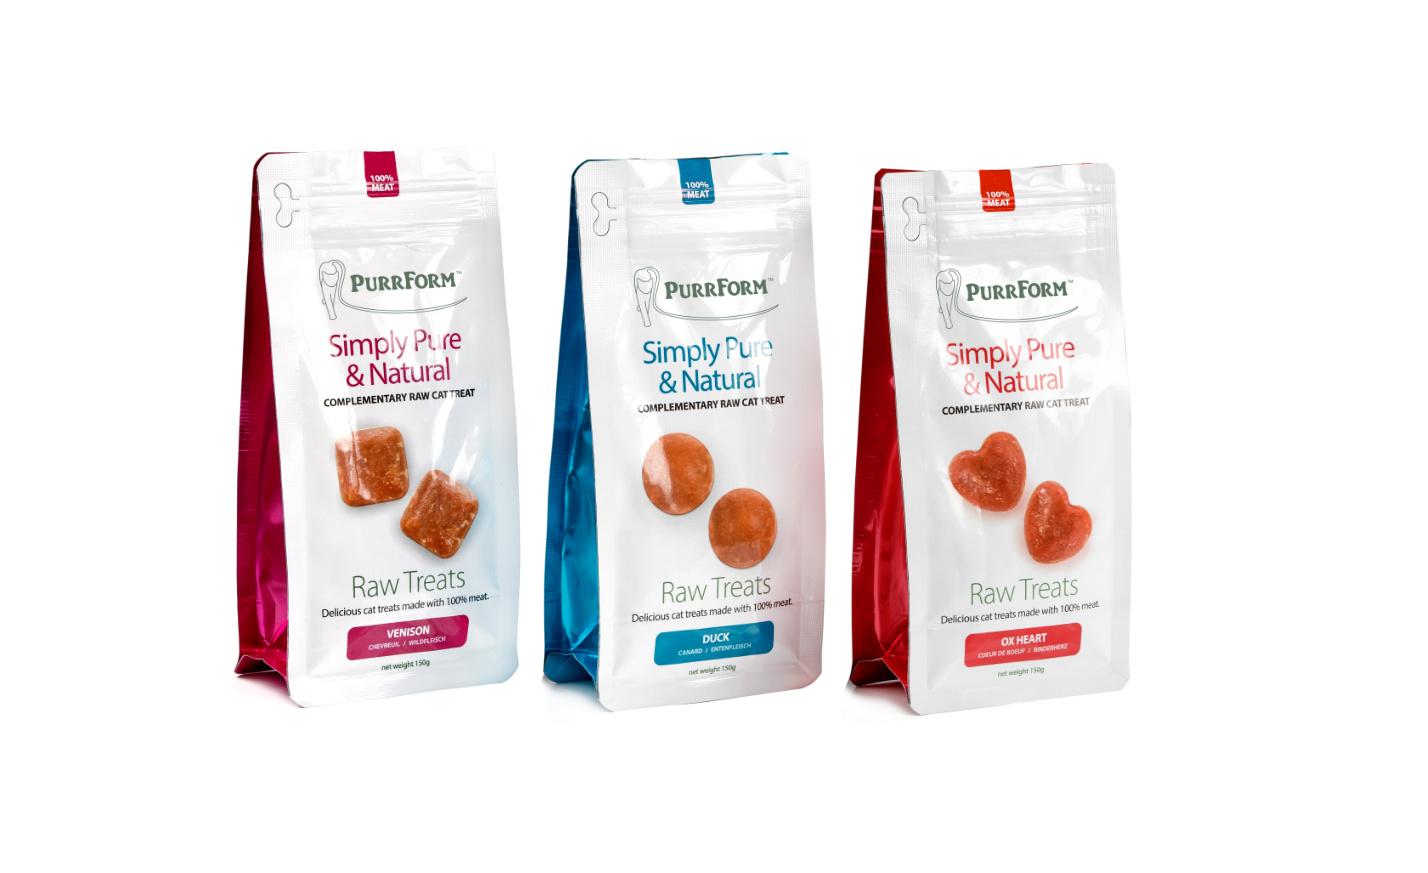 Purrform raw packaging - Raw Treats